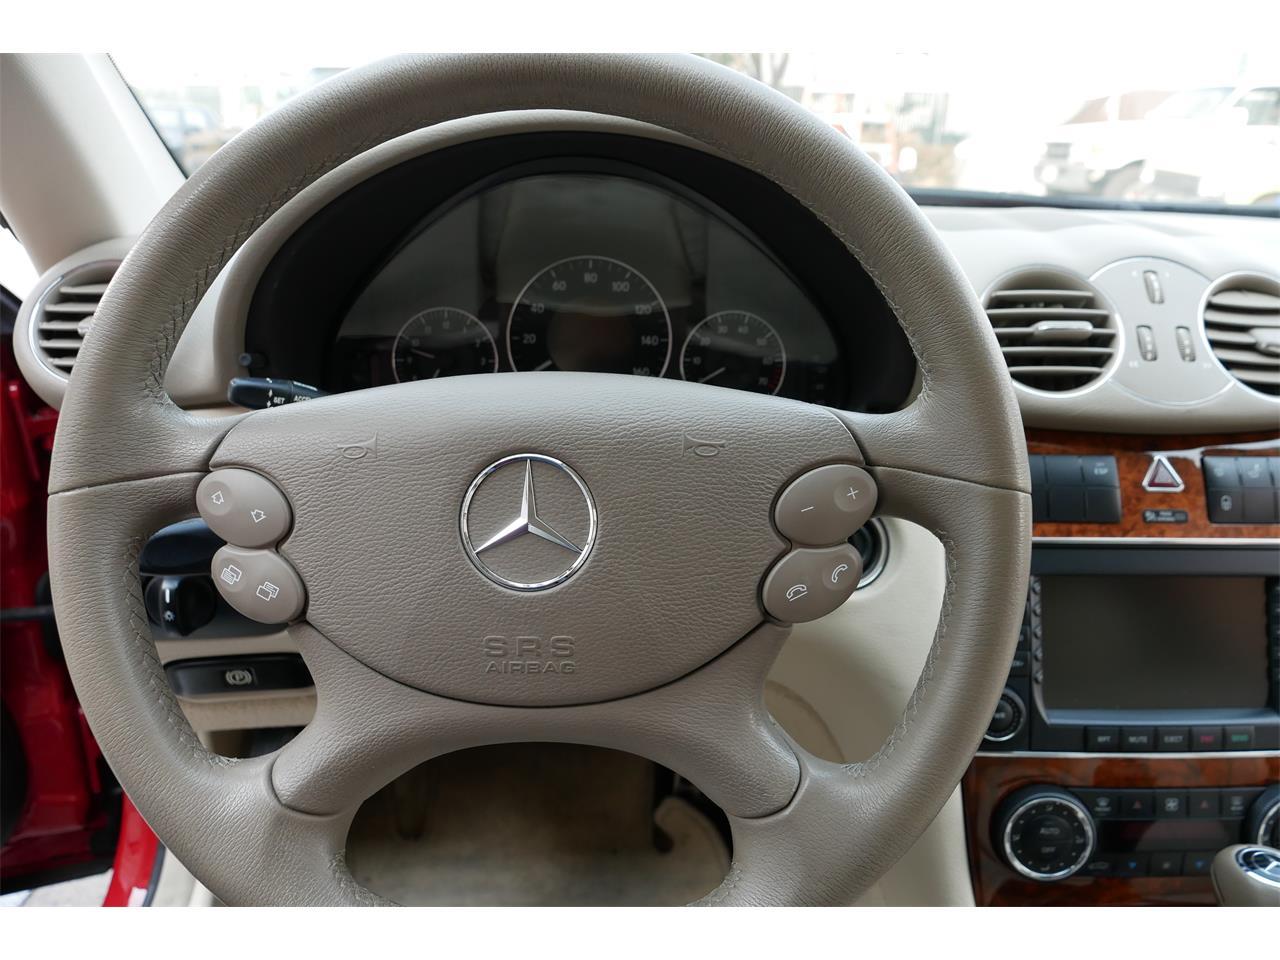 2008 Mercedes-Benz CLK-Class (CC-1390283) for sale in Reno, Nevada